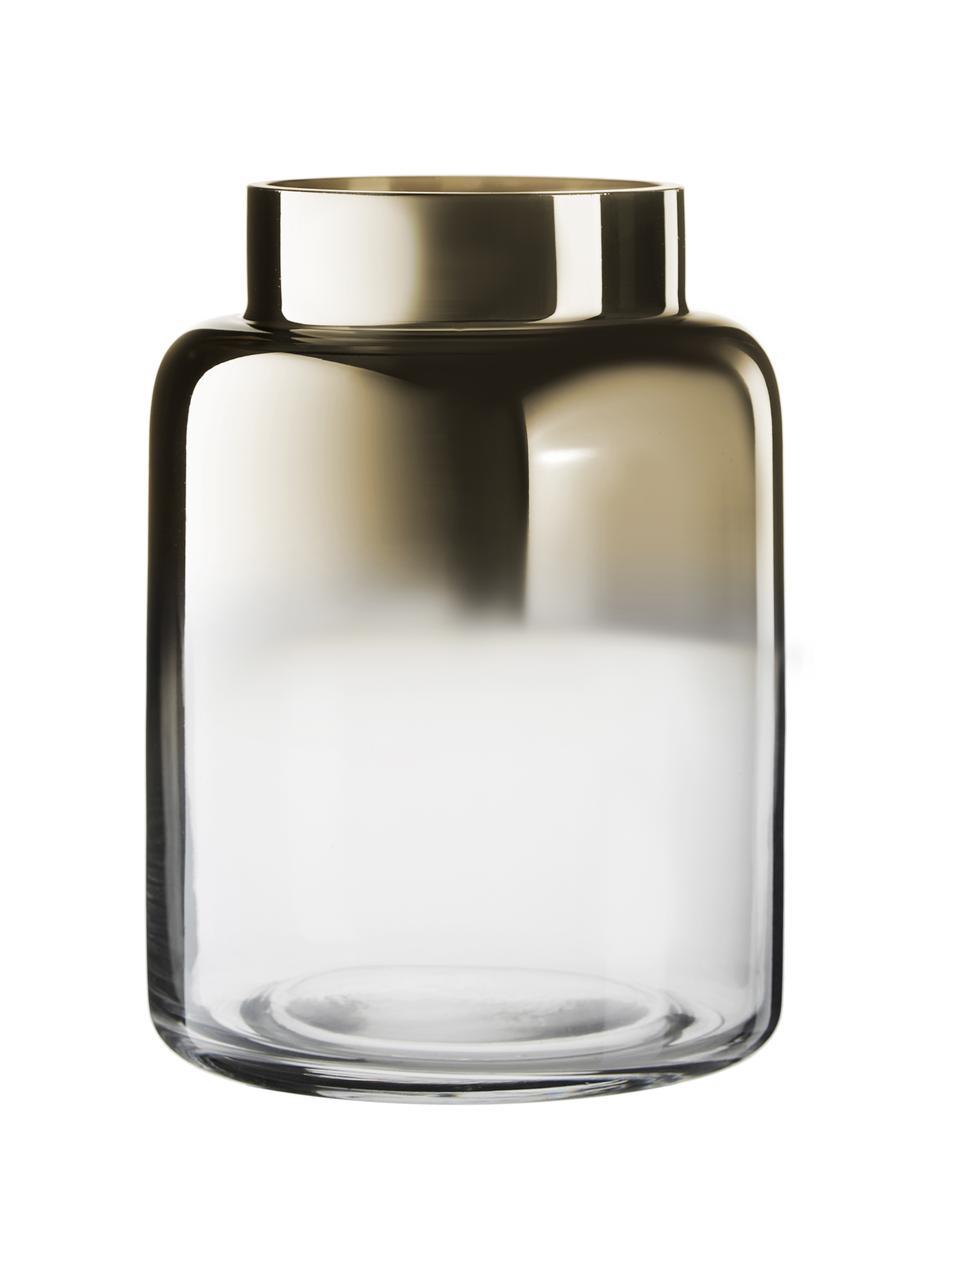 Mundgeblasene Vase Uma, Glas, Transparent,Gold, Ø 15 x H 20 cm